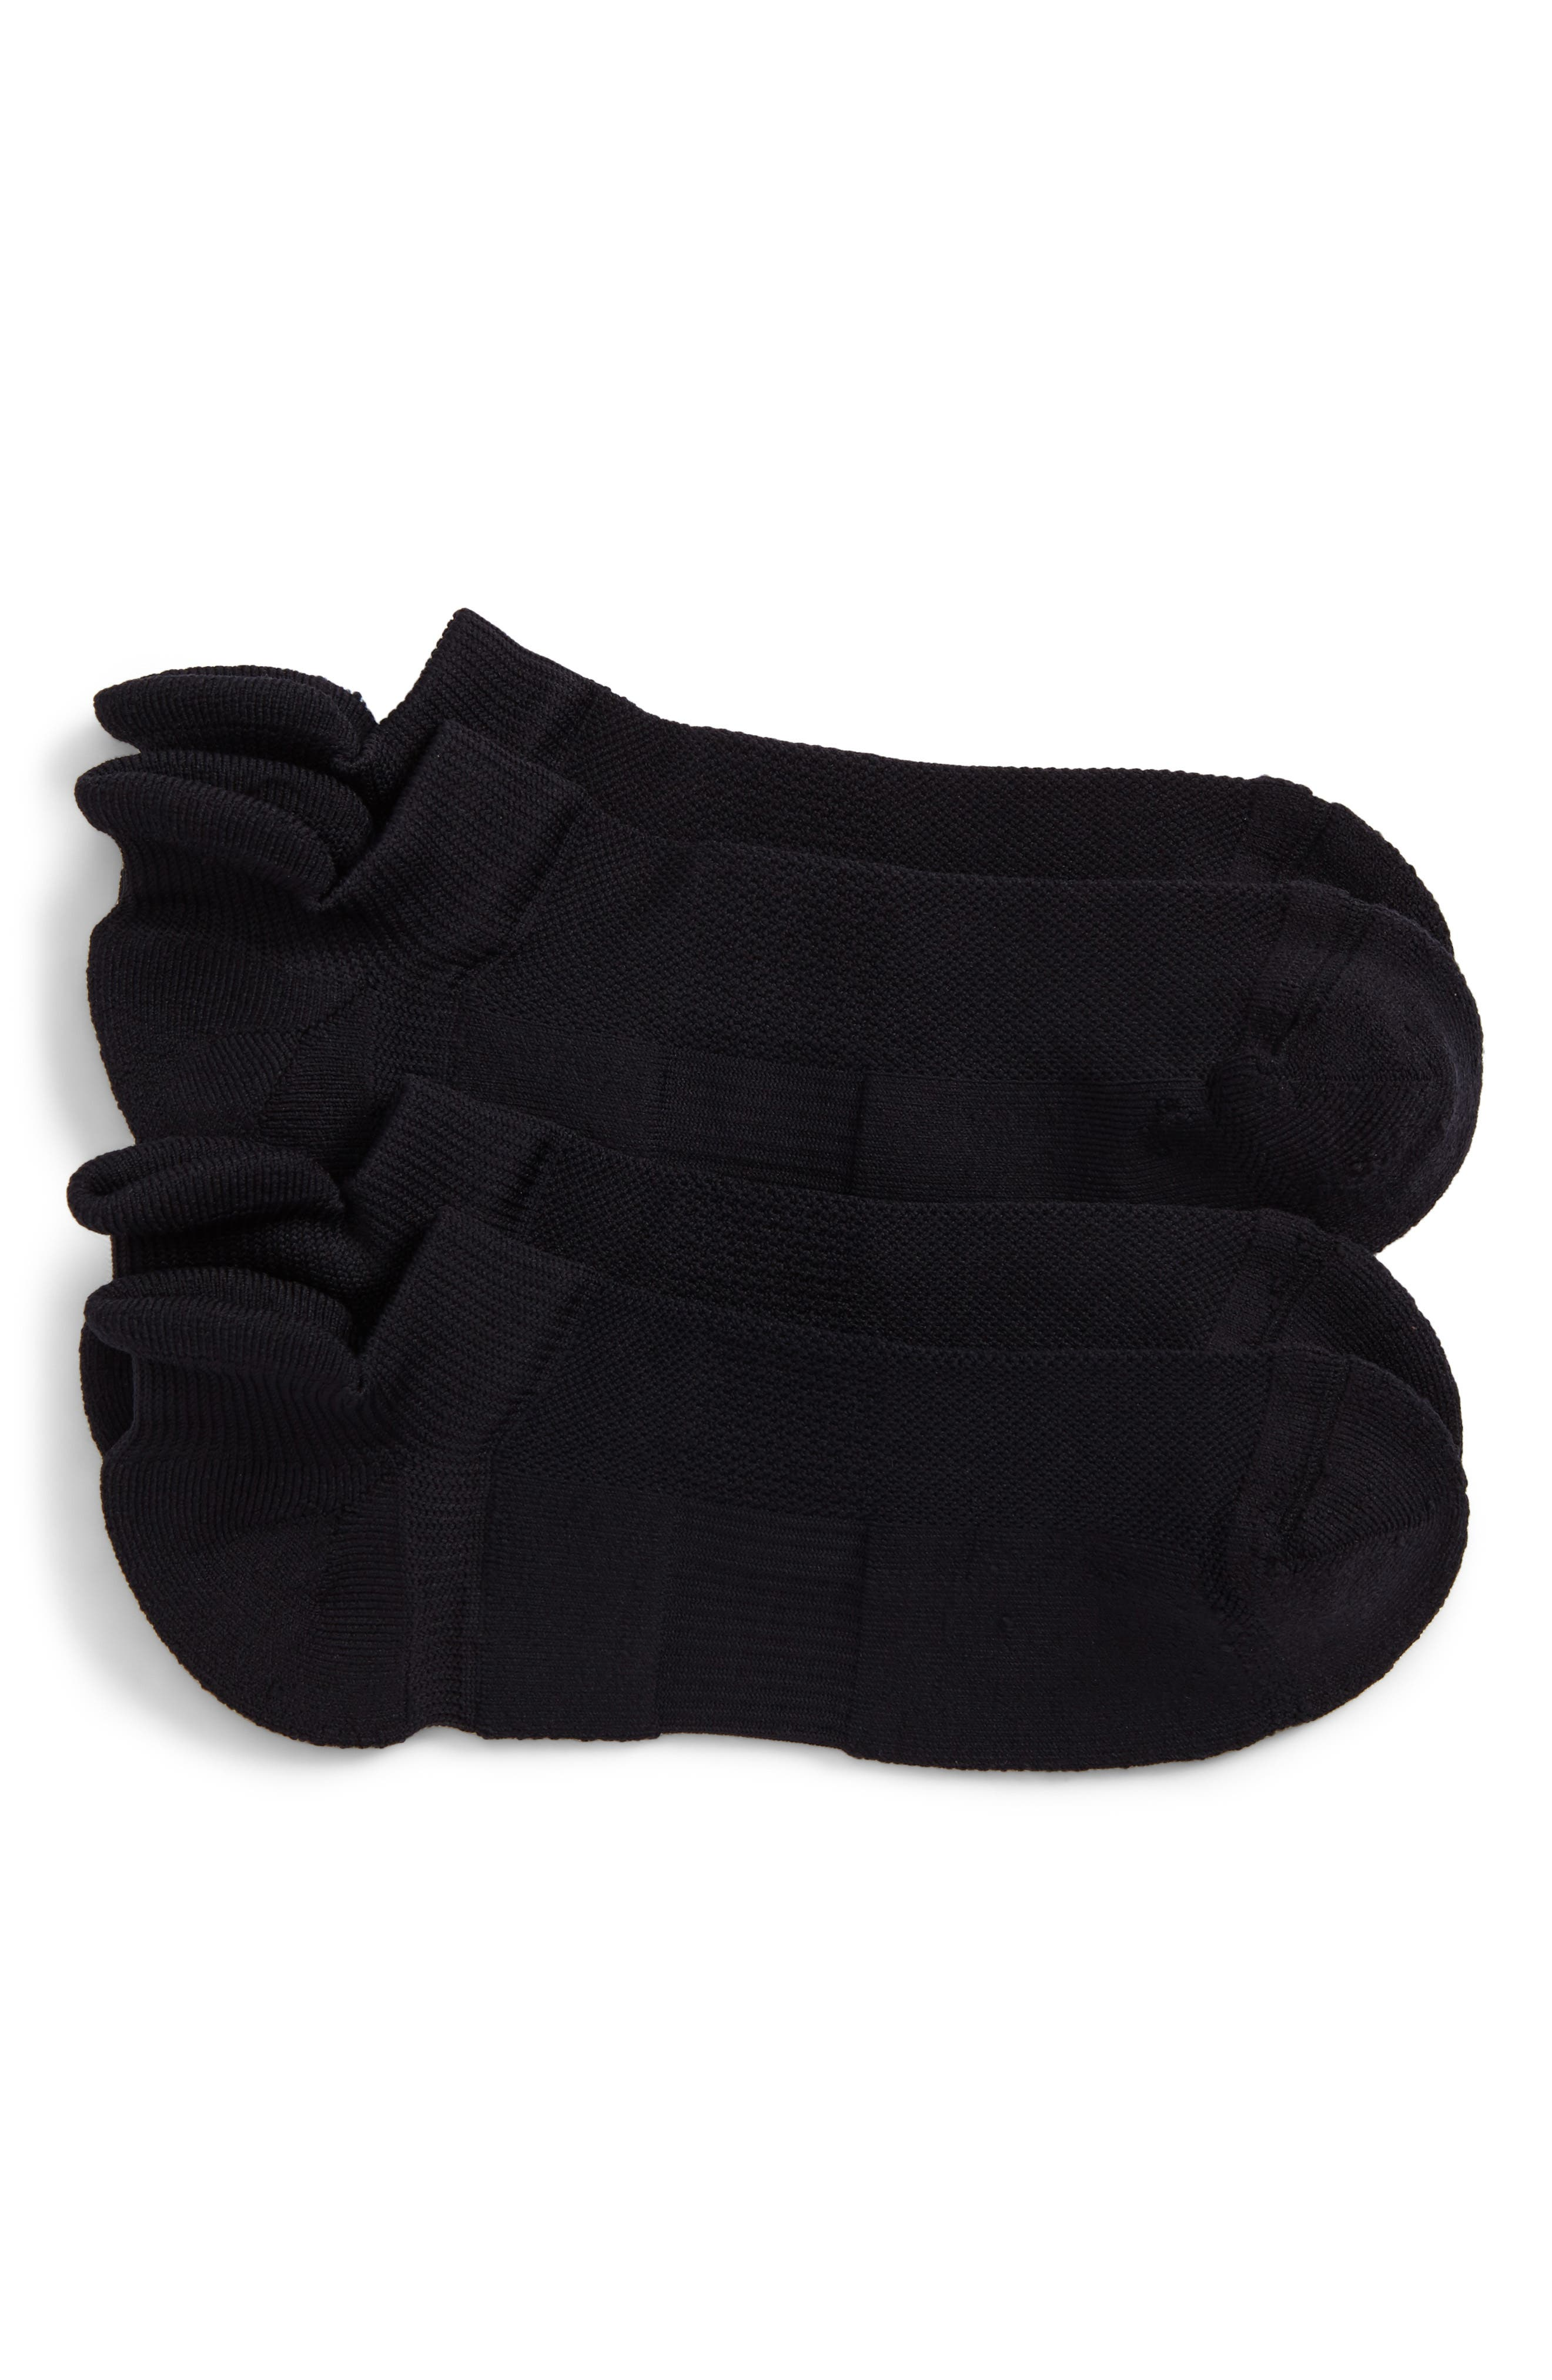 2-Pack Tech-Smart No-Show Socks,                         Main,                         color, 001